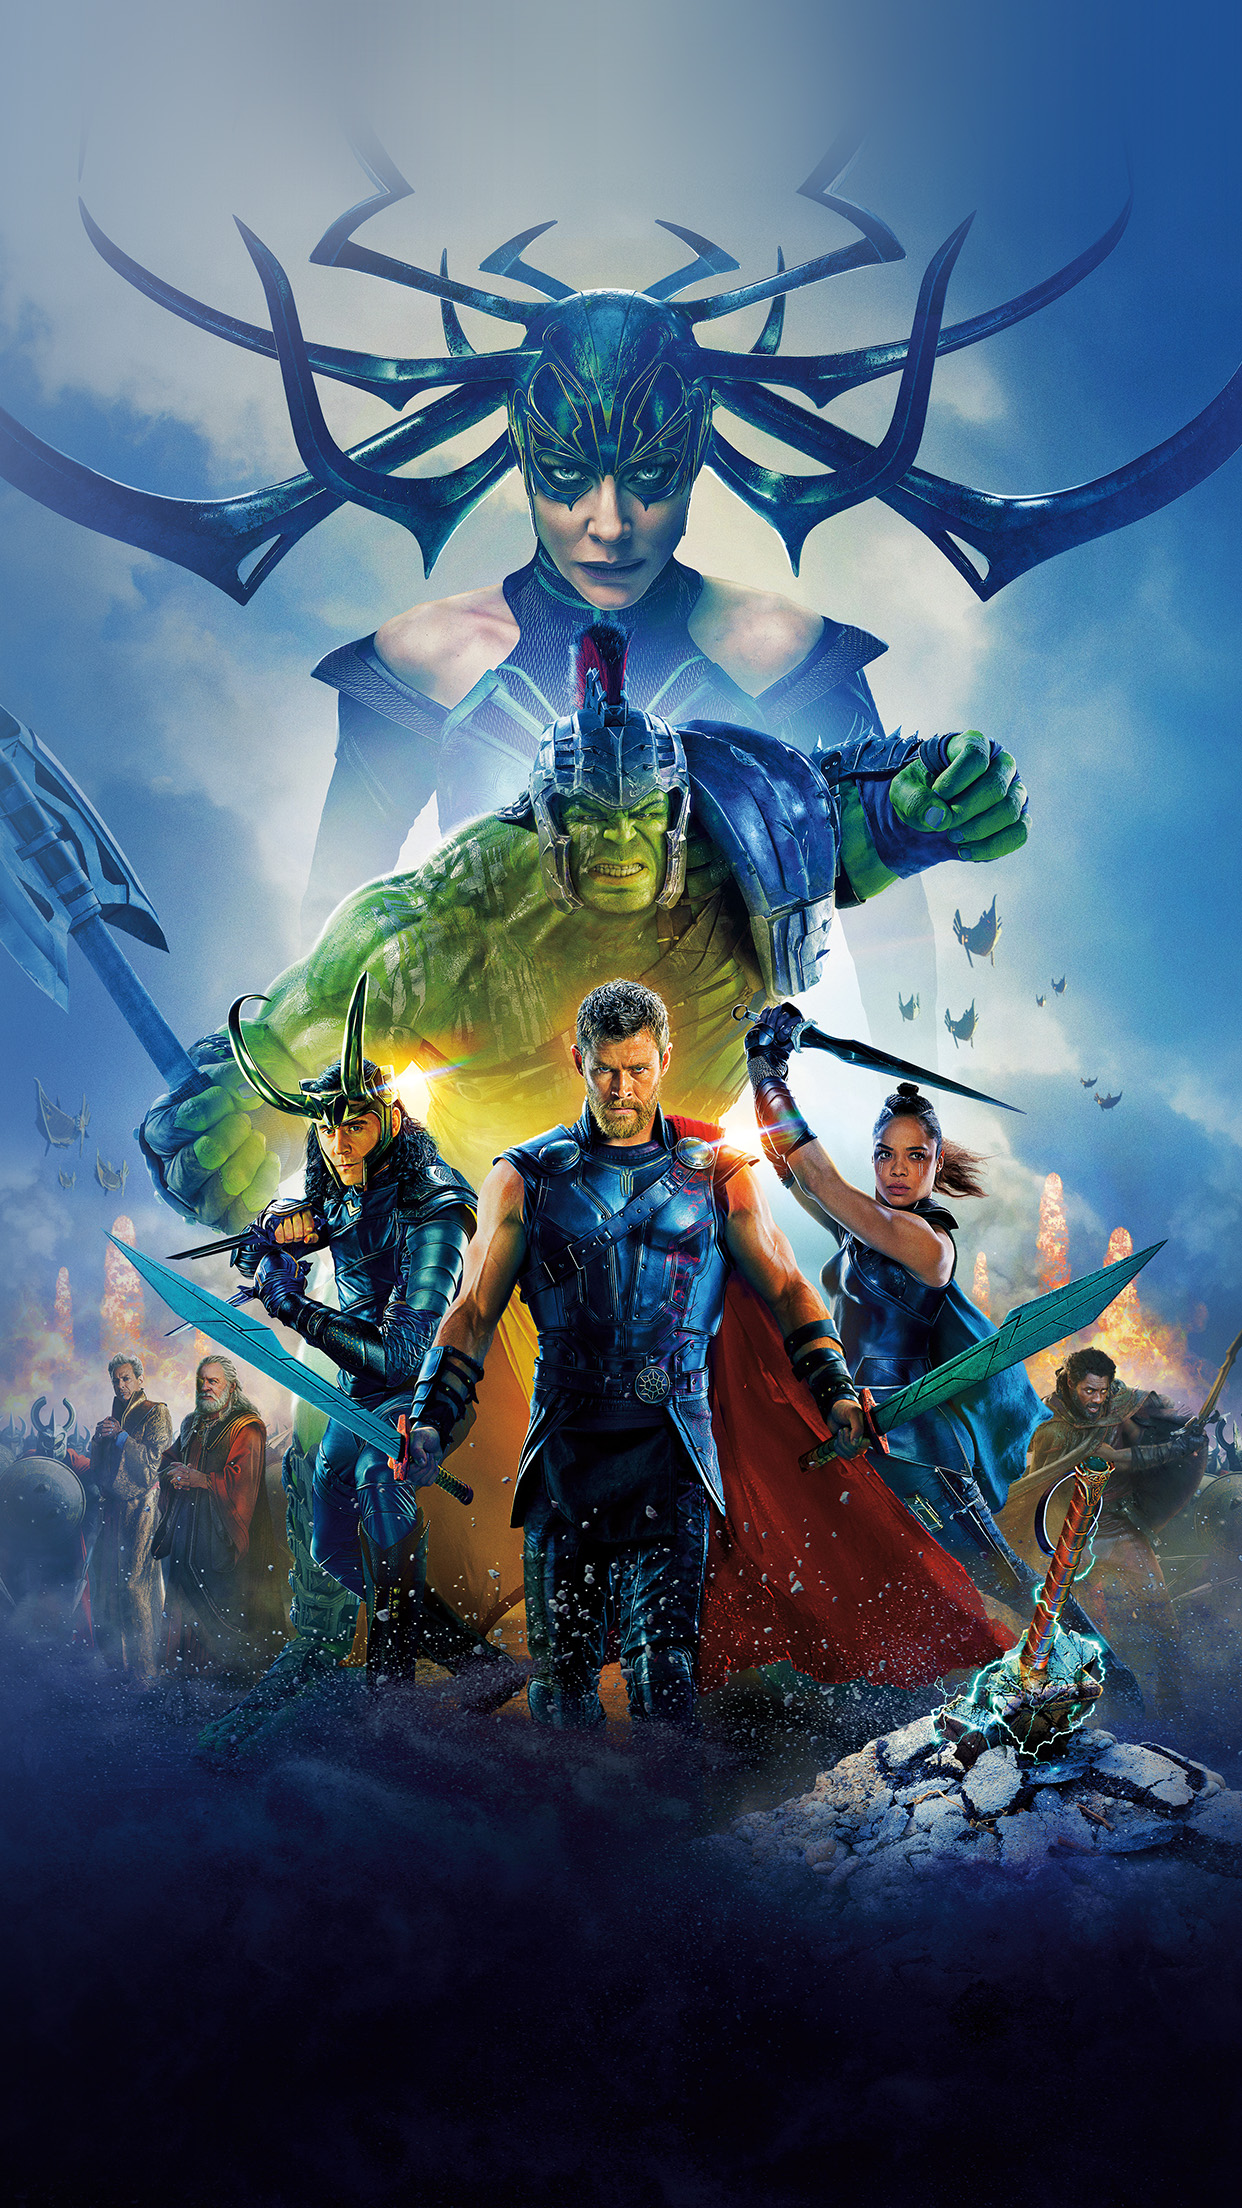 Be50 thor ragnarok film marvel art illustration wallpaper - Thor art wallpaper ...